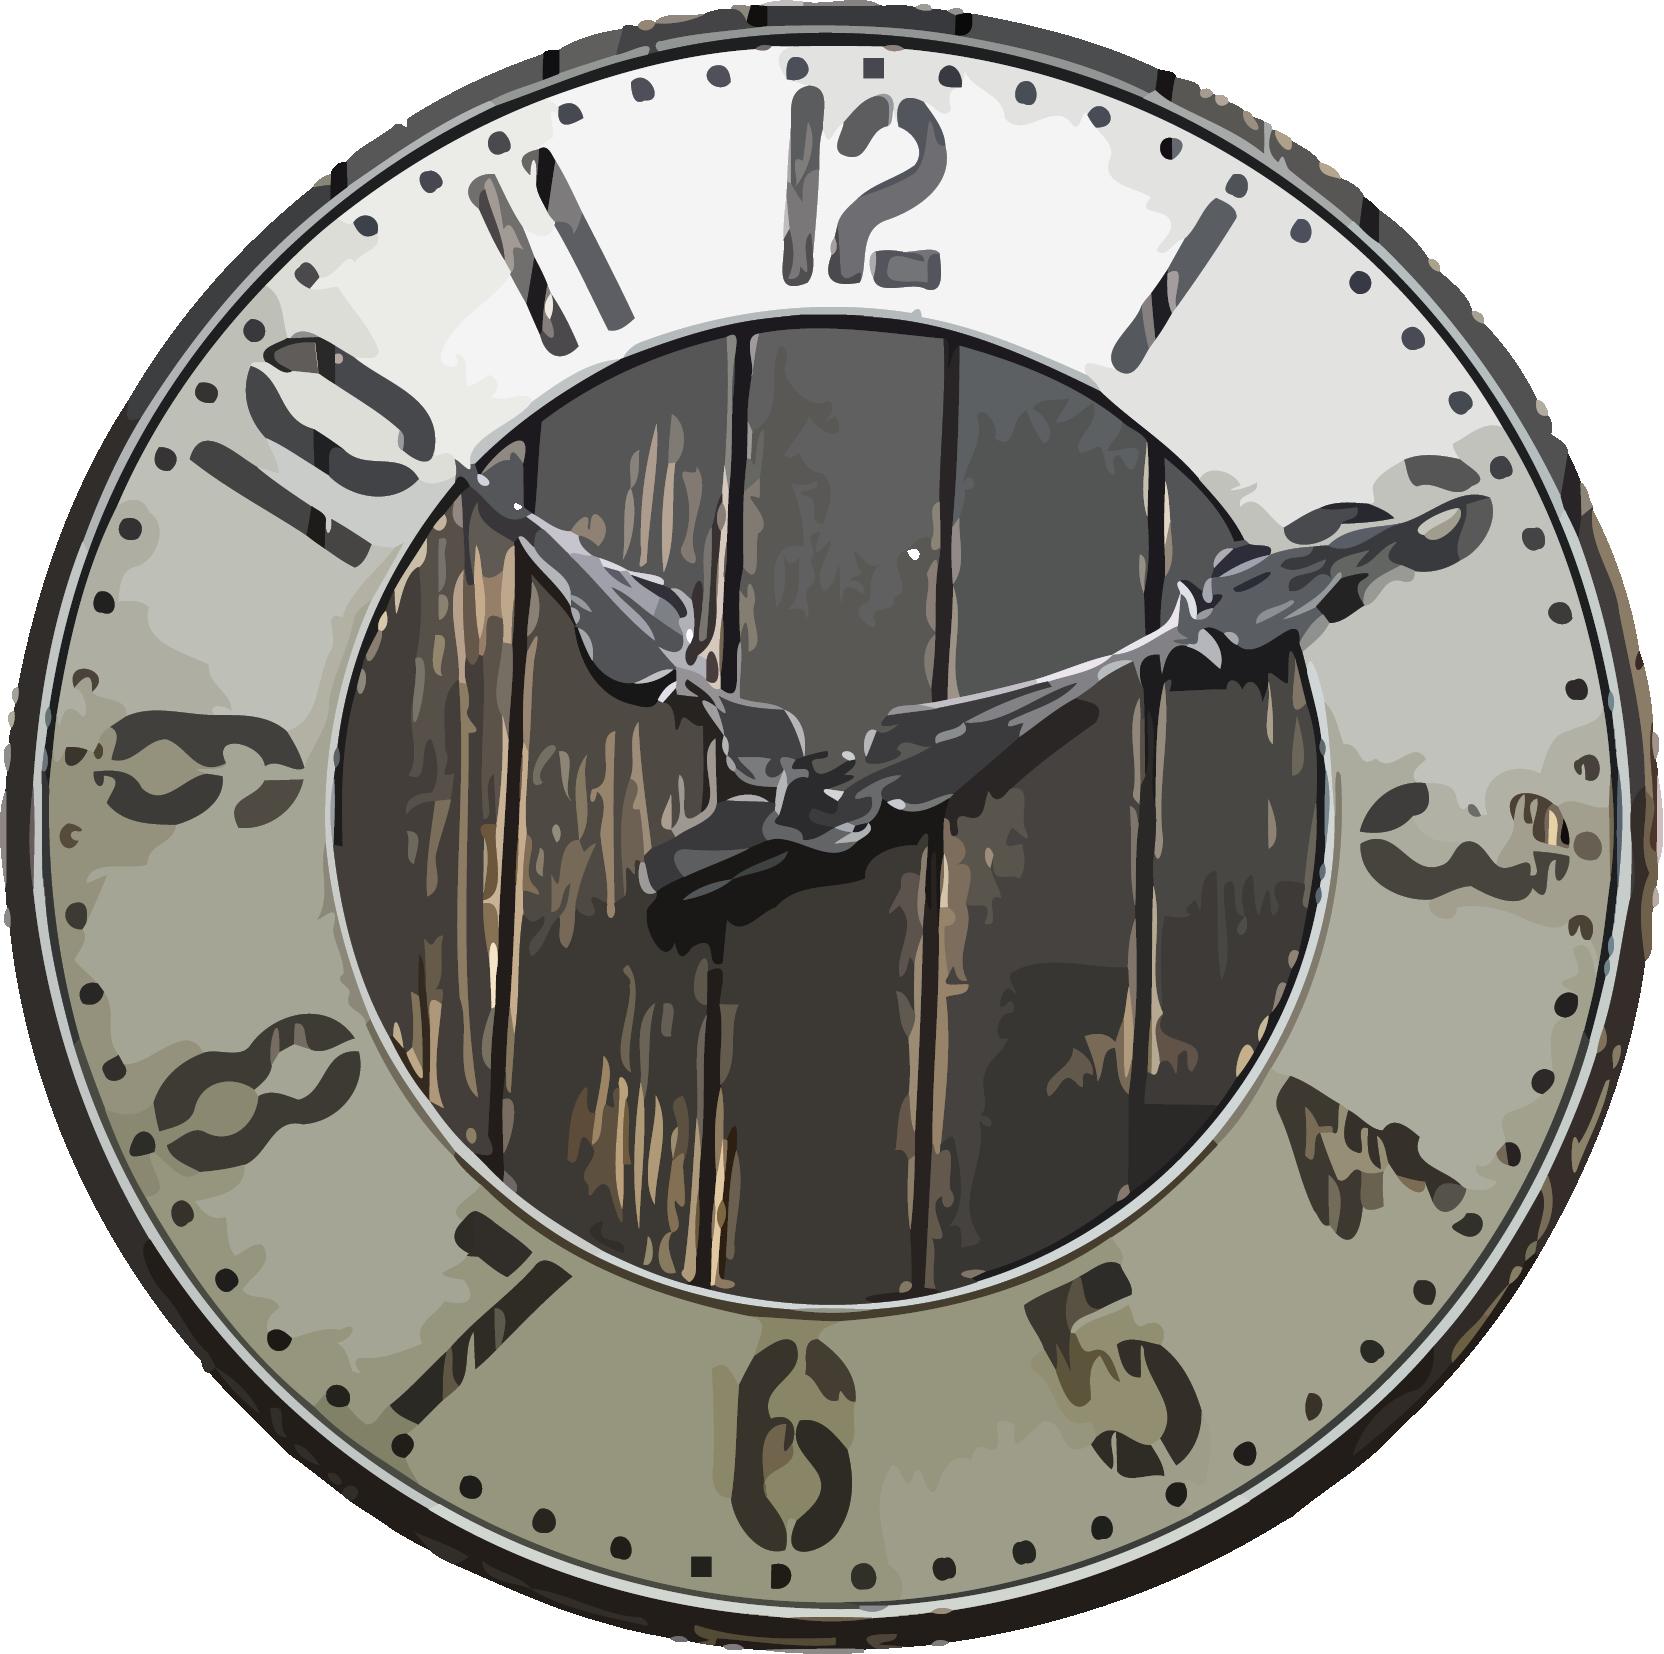 Transparent vintage clock clipart - Rustic Large Farmhouse Wall Clock